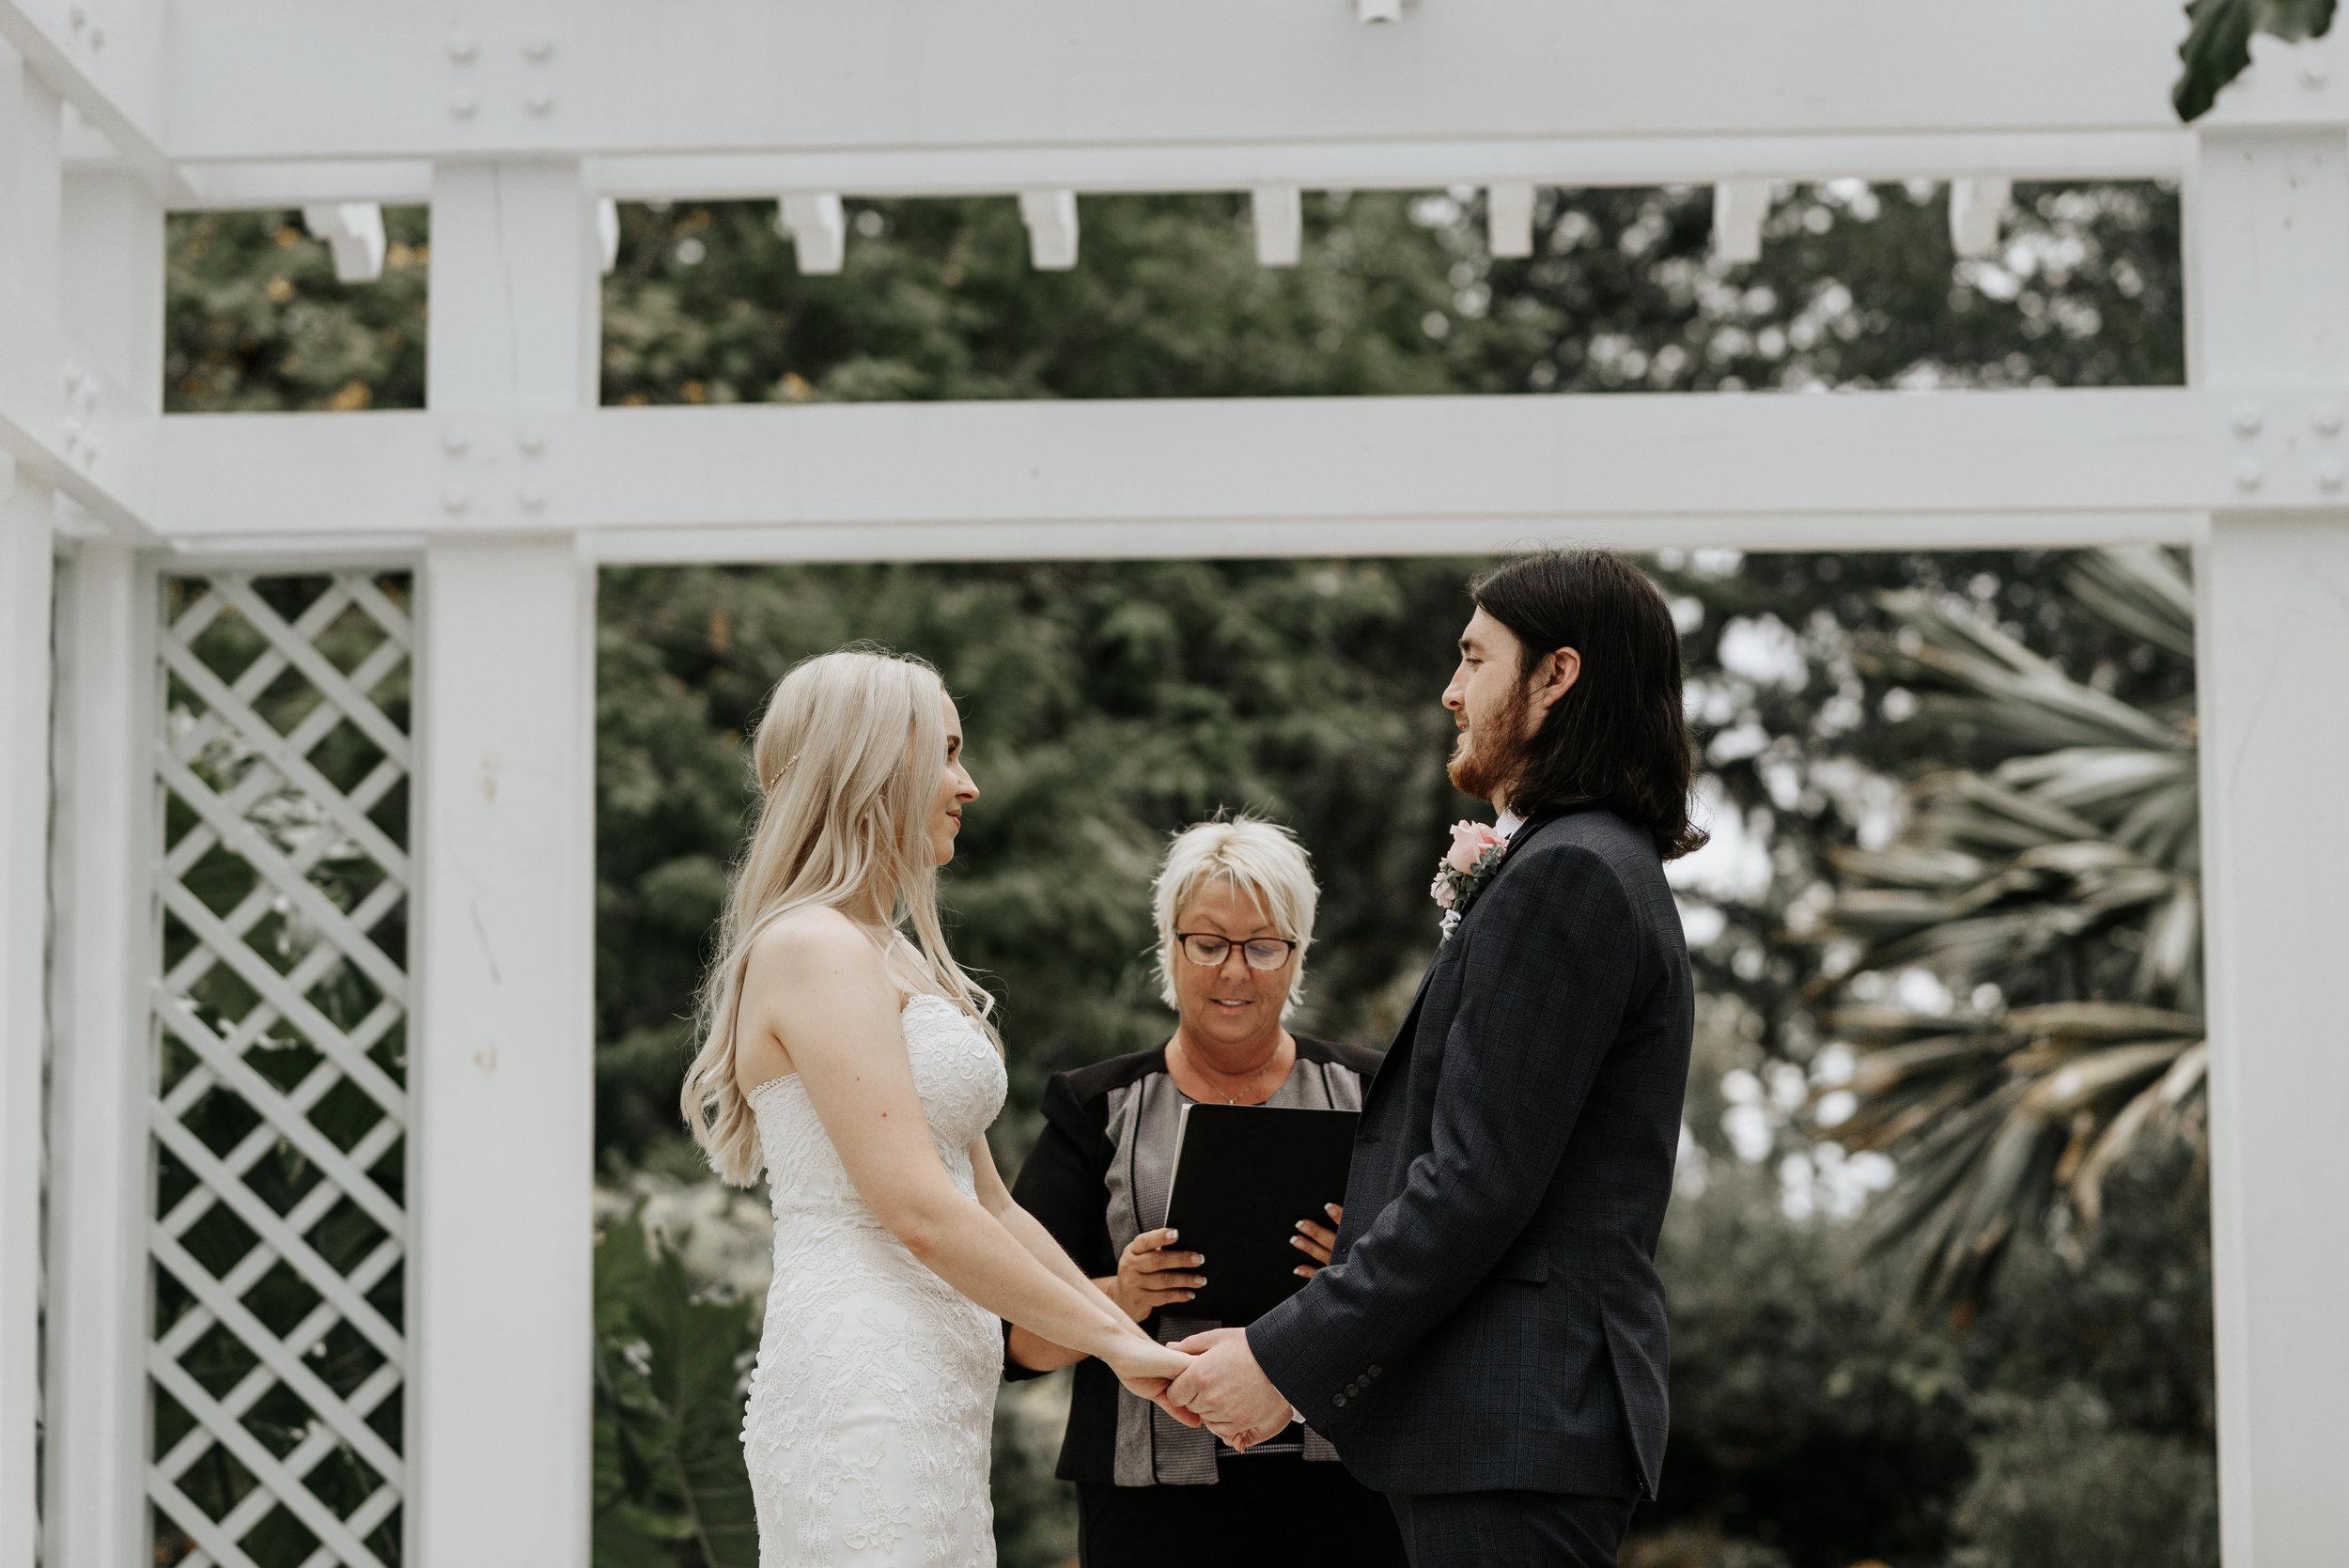 Lora-Richard-Wedding-1081.jpg